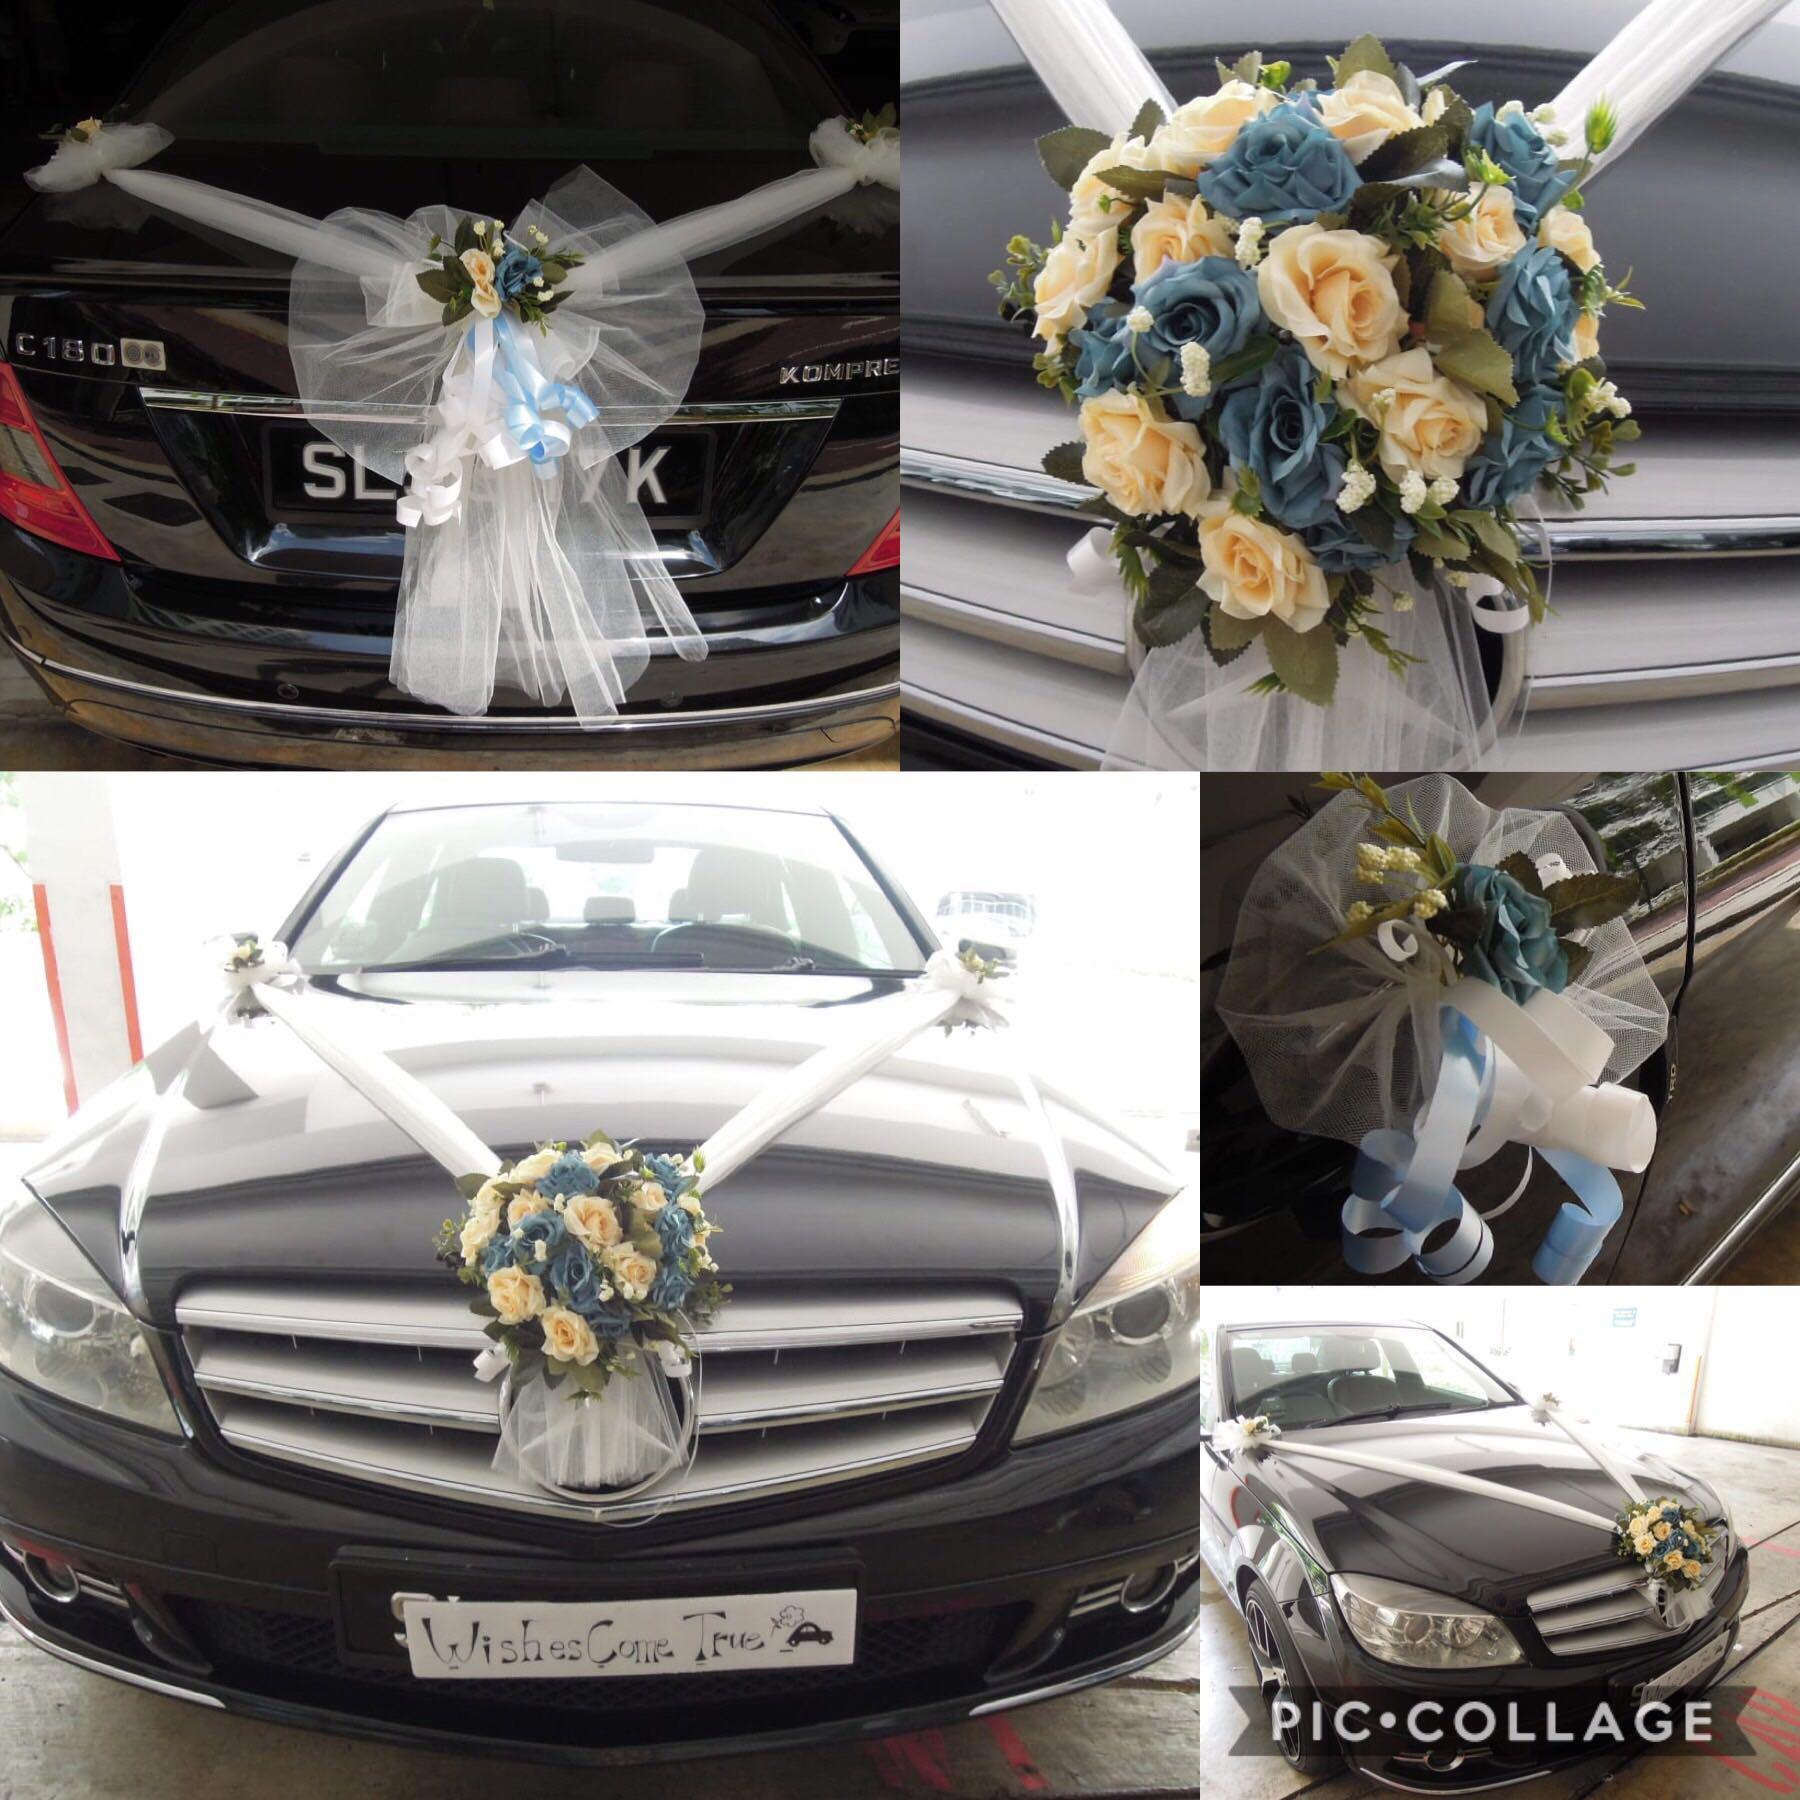 Wedding Car Decoration / Wedding Car Deco / Wedding Car Decor / Bridal Car Decoration / Bridal Car Deco / Bridal Car Decor